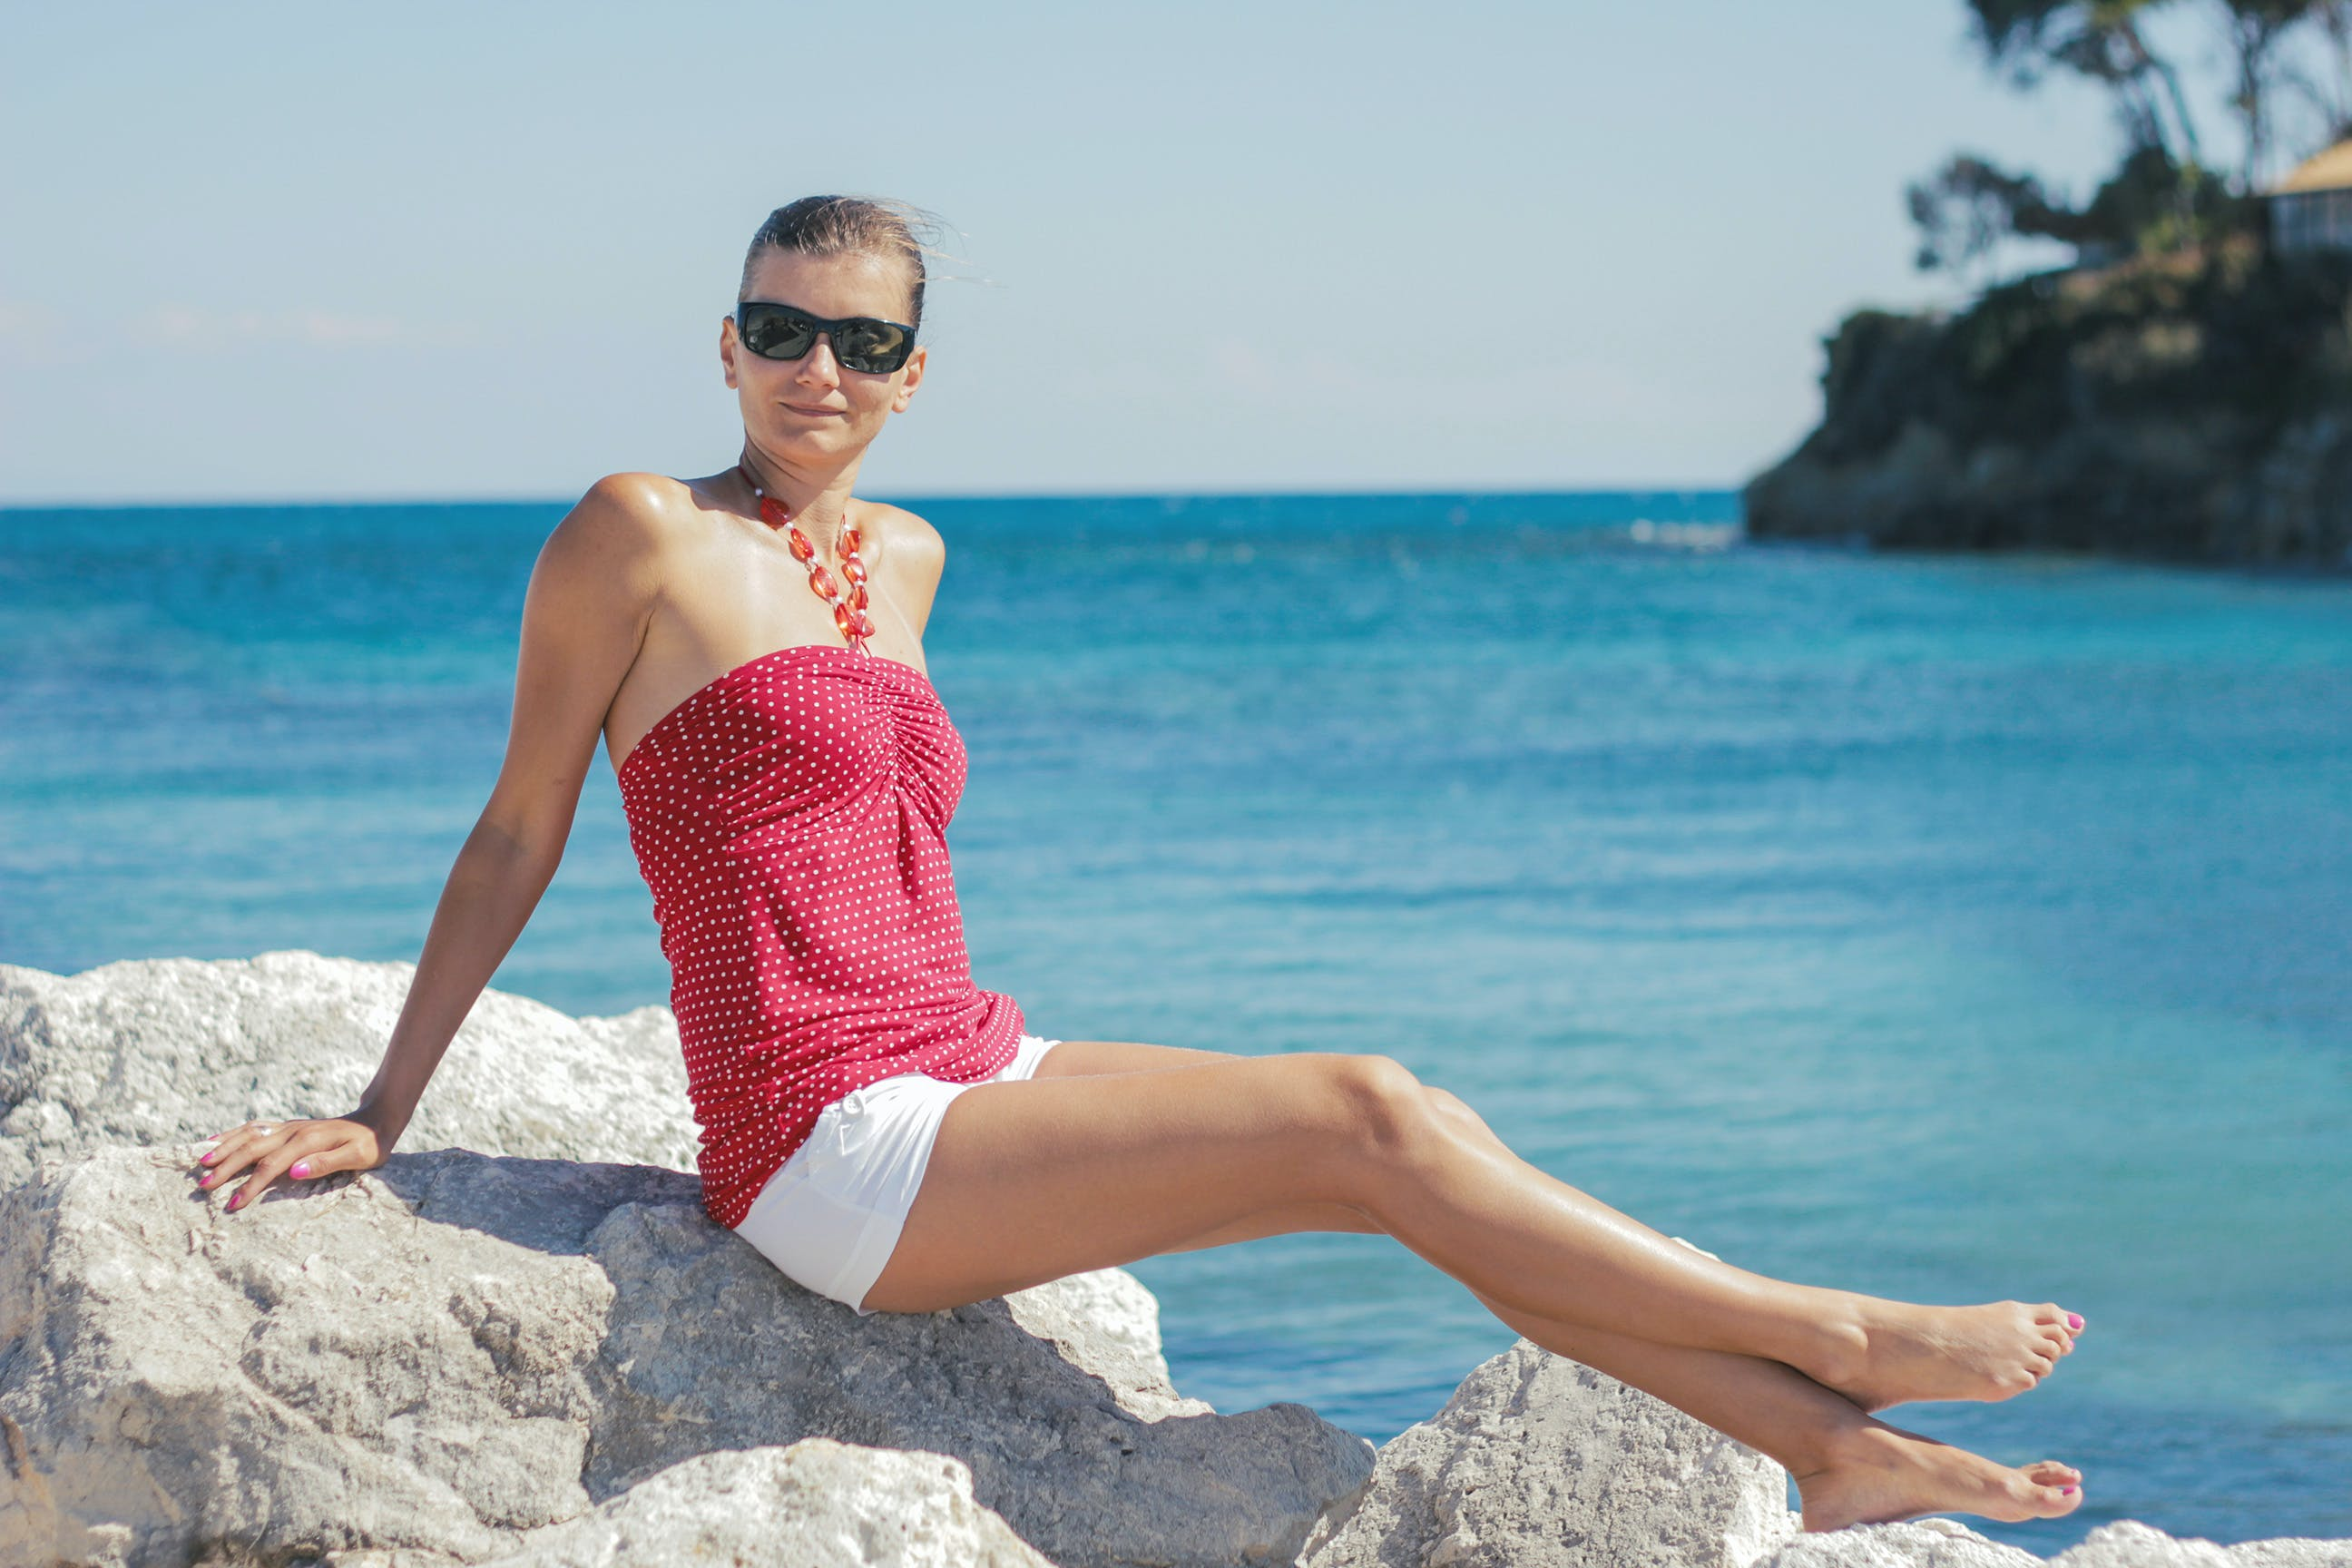 Woman Wearing Pink Tube Top Sitting on Rock